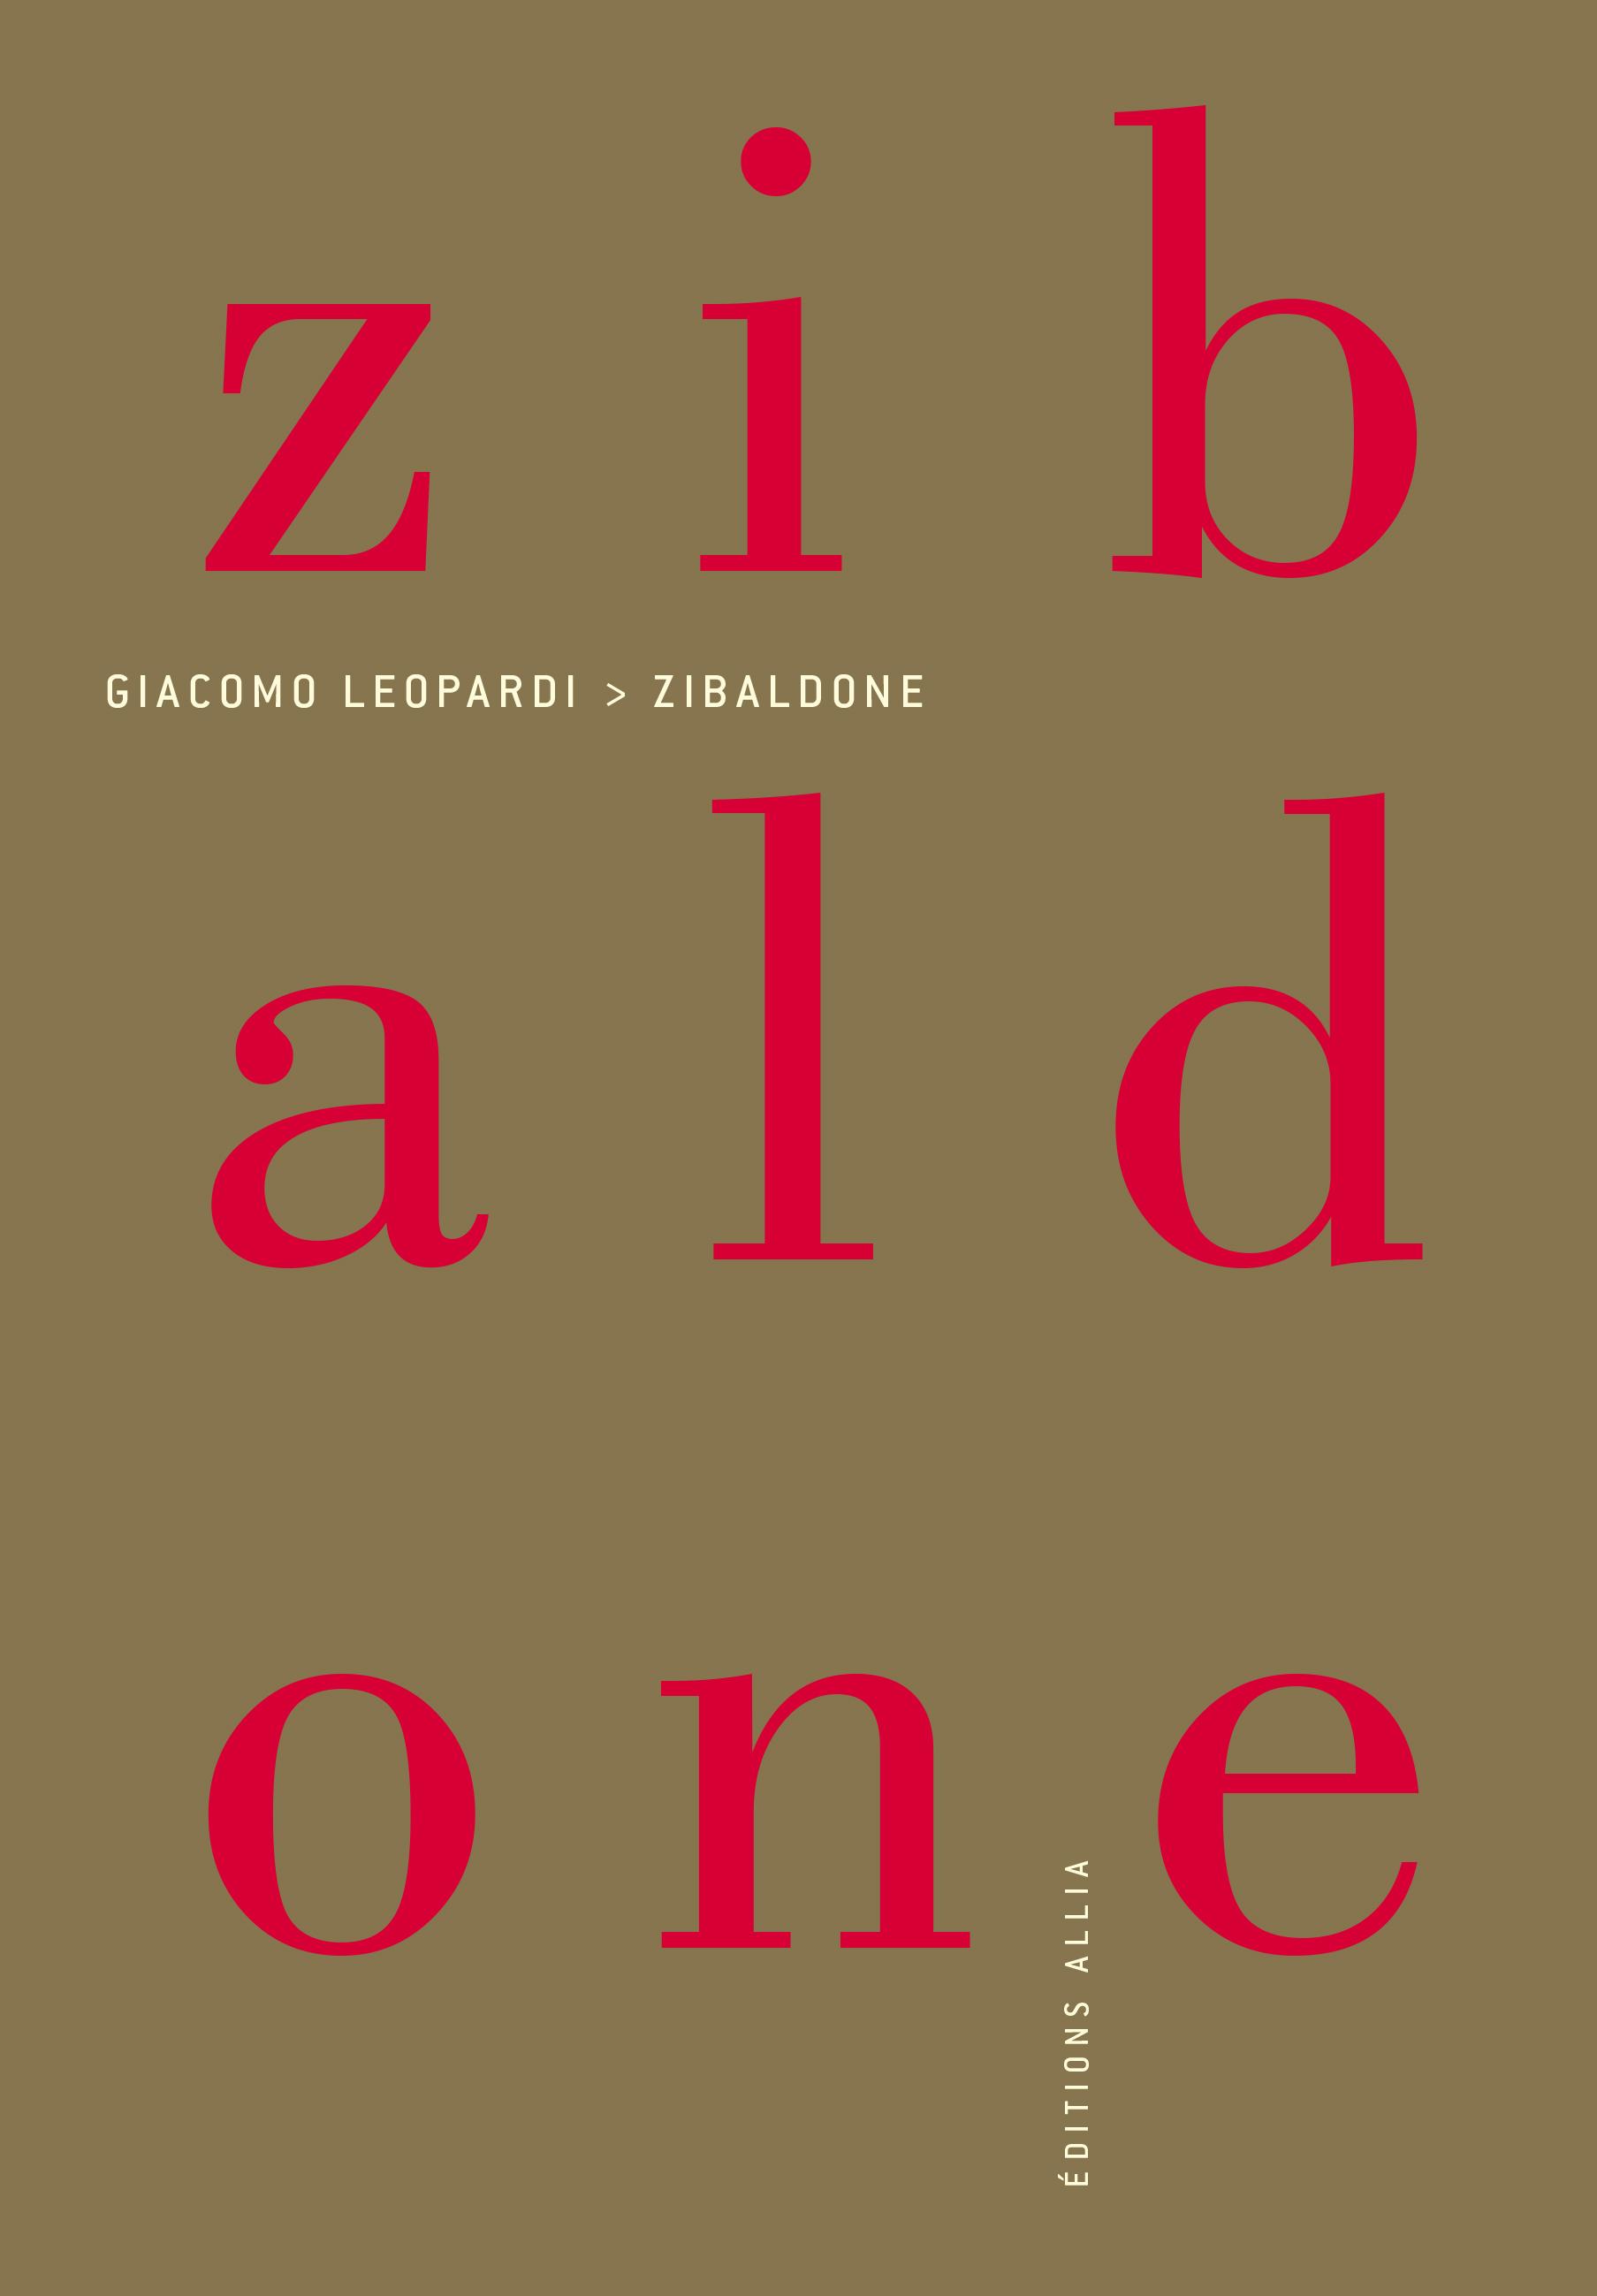 G. Leopardi, Zibaldone (éd. B. Schefer)